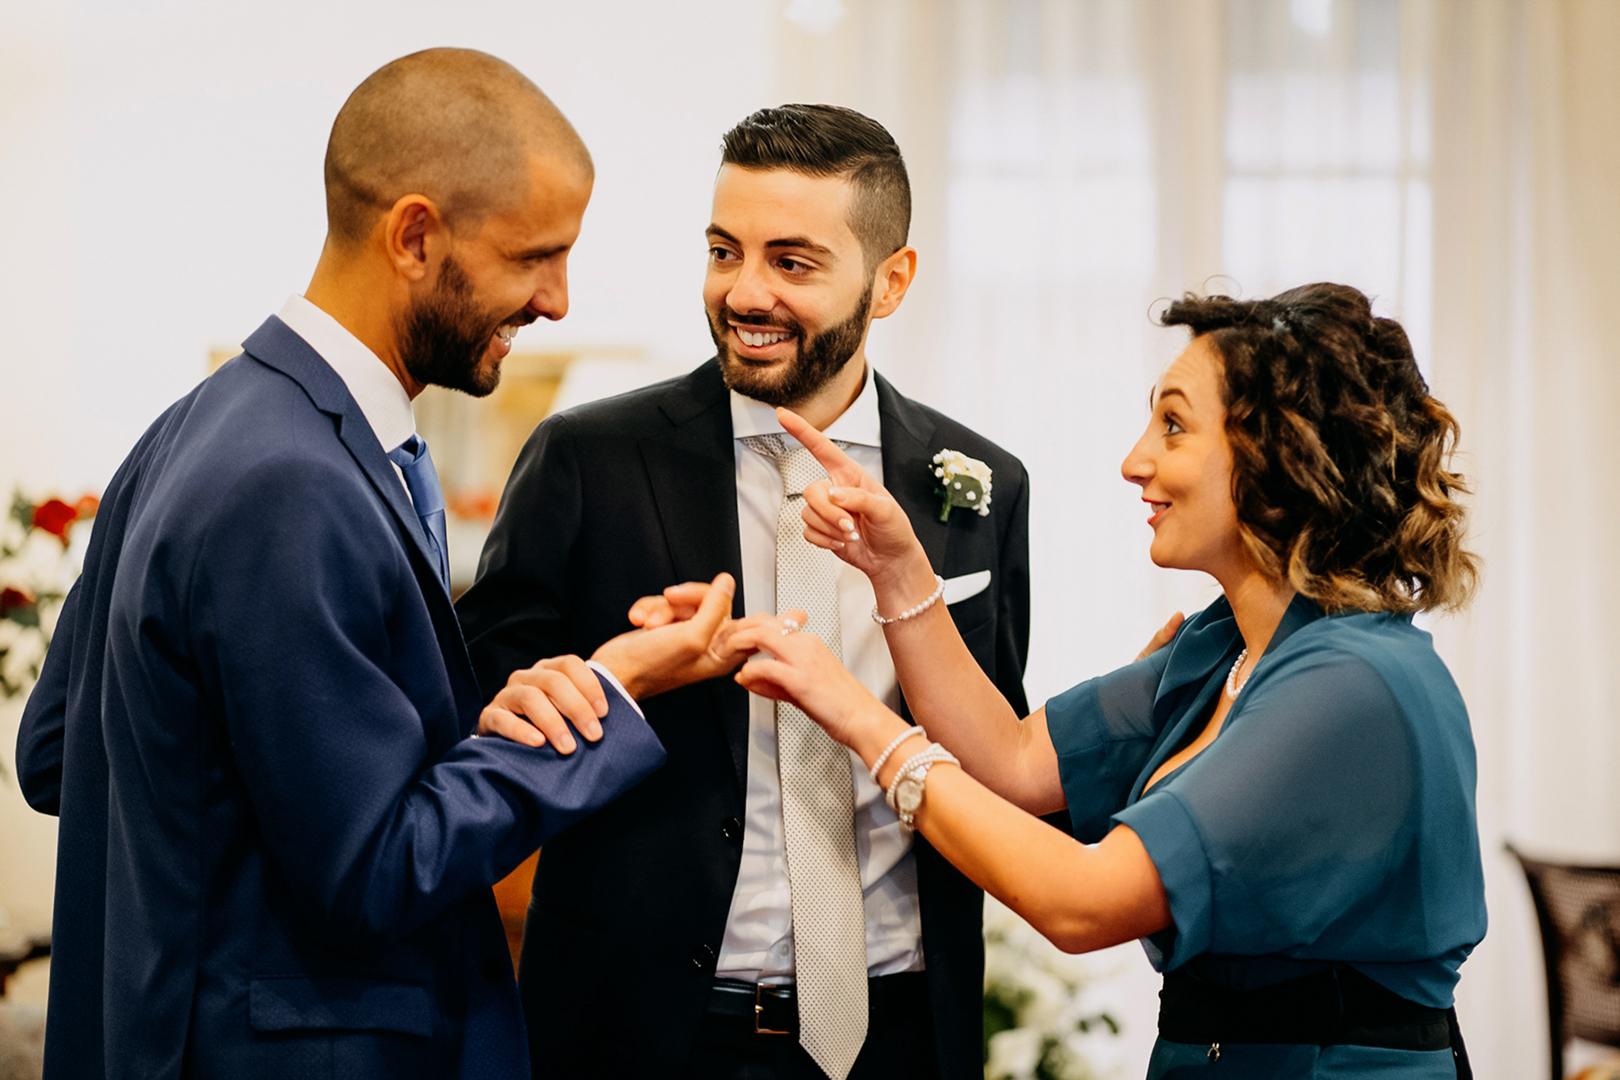 17 gianni-lepore-amici-testimoni-sposo